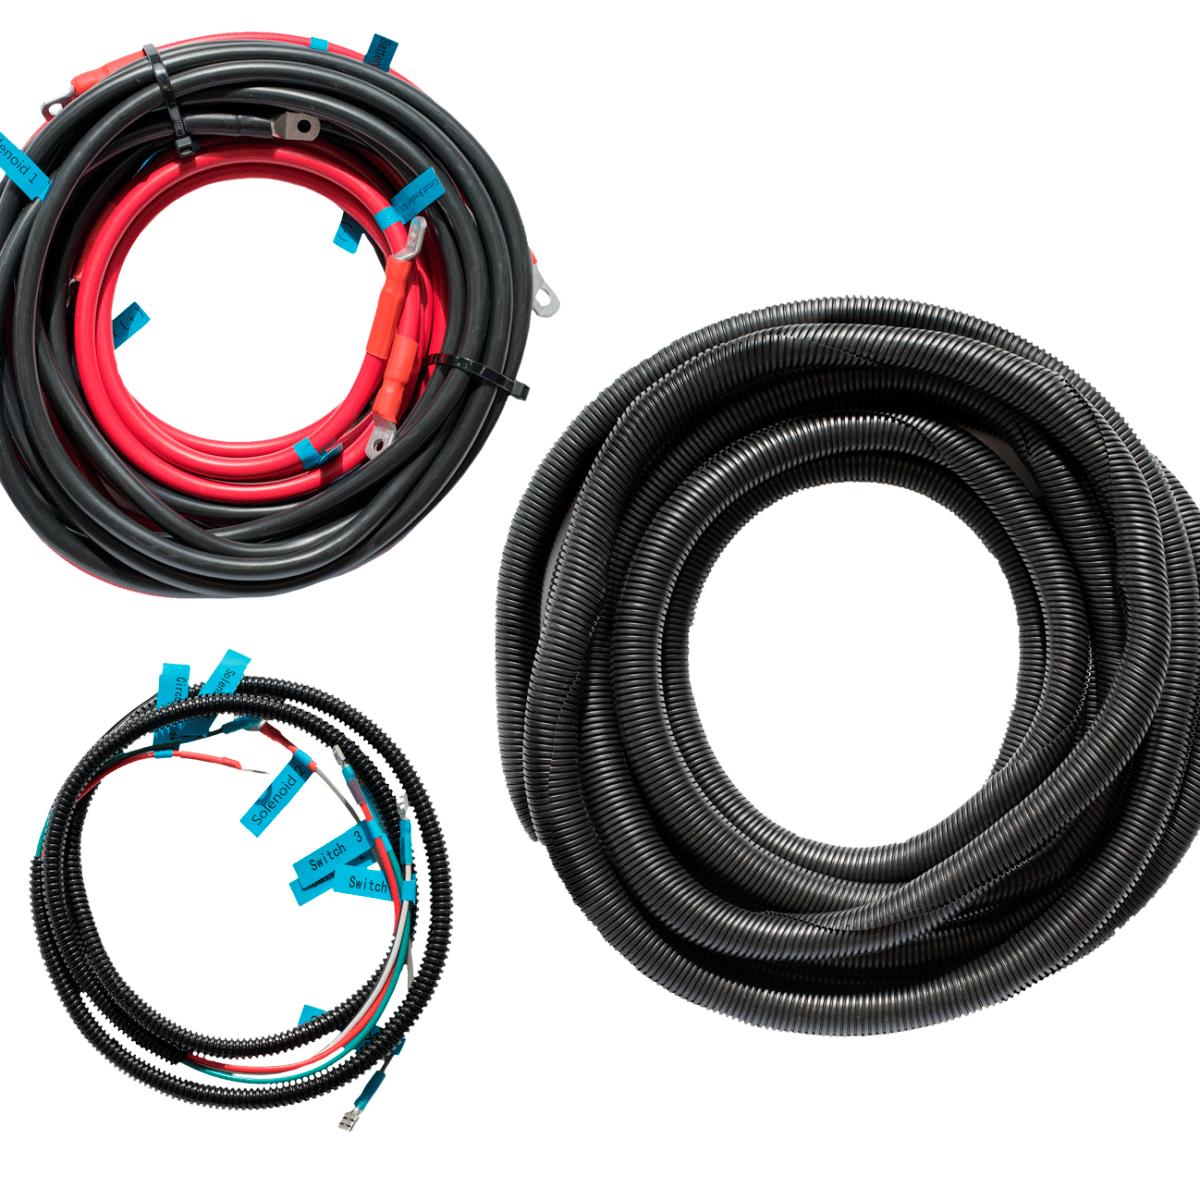 Viper Pro Series II 1000 Electric Drum Anchor Winch Bundle 3002IN